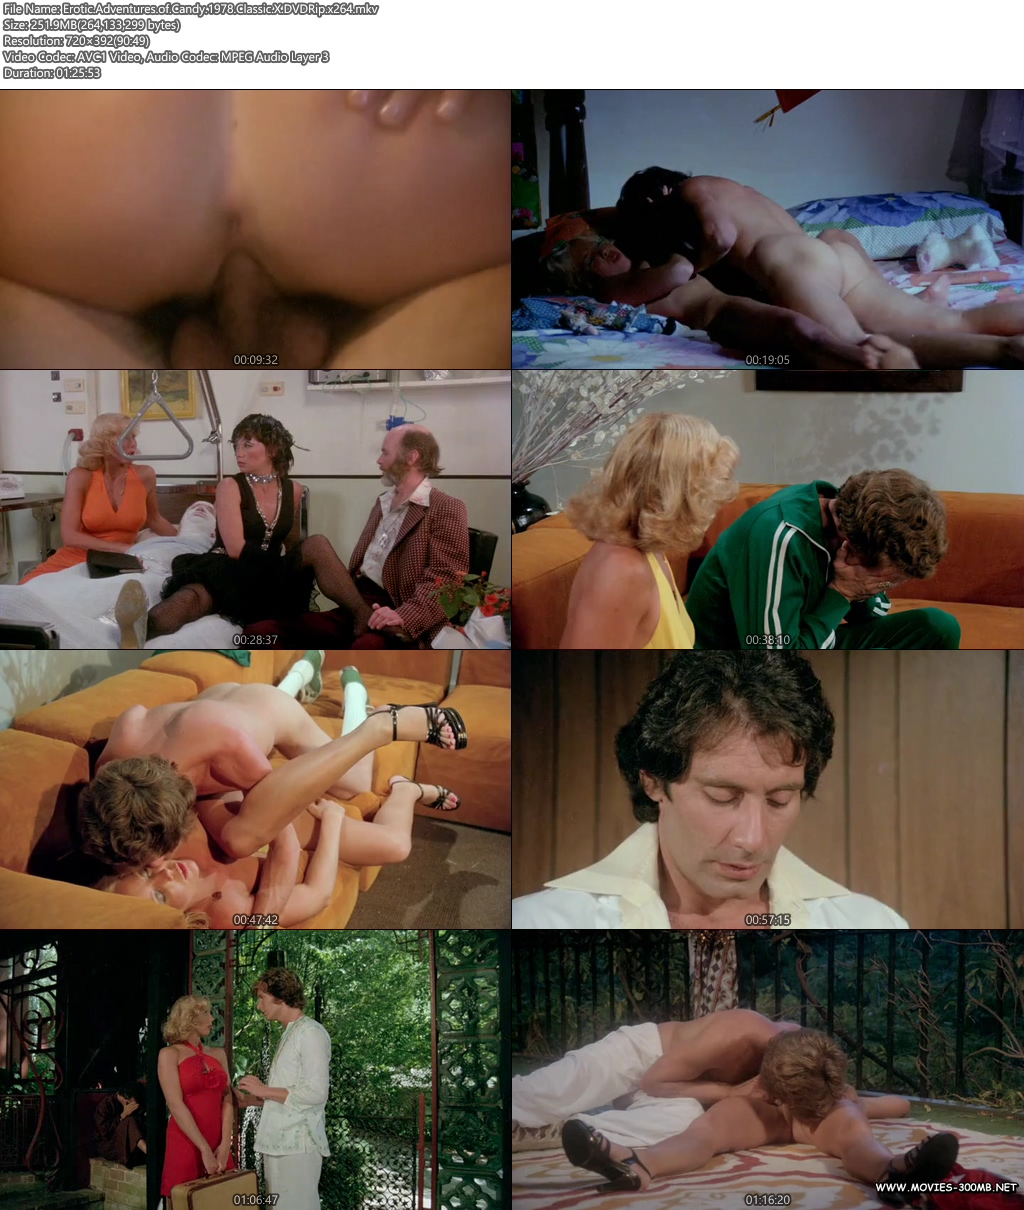 Erotic Adventures of Candy 1978 Classic X DVDRip 250MB x264 Screenshot